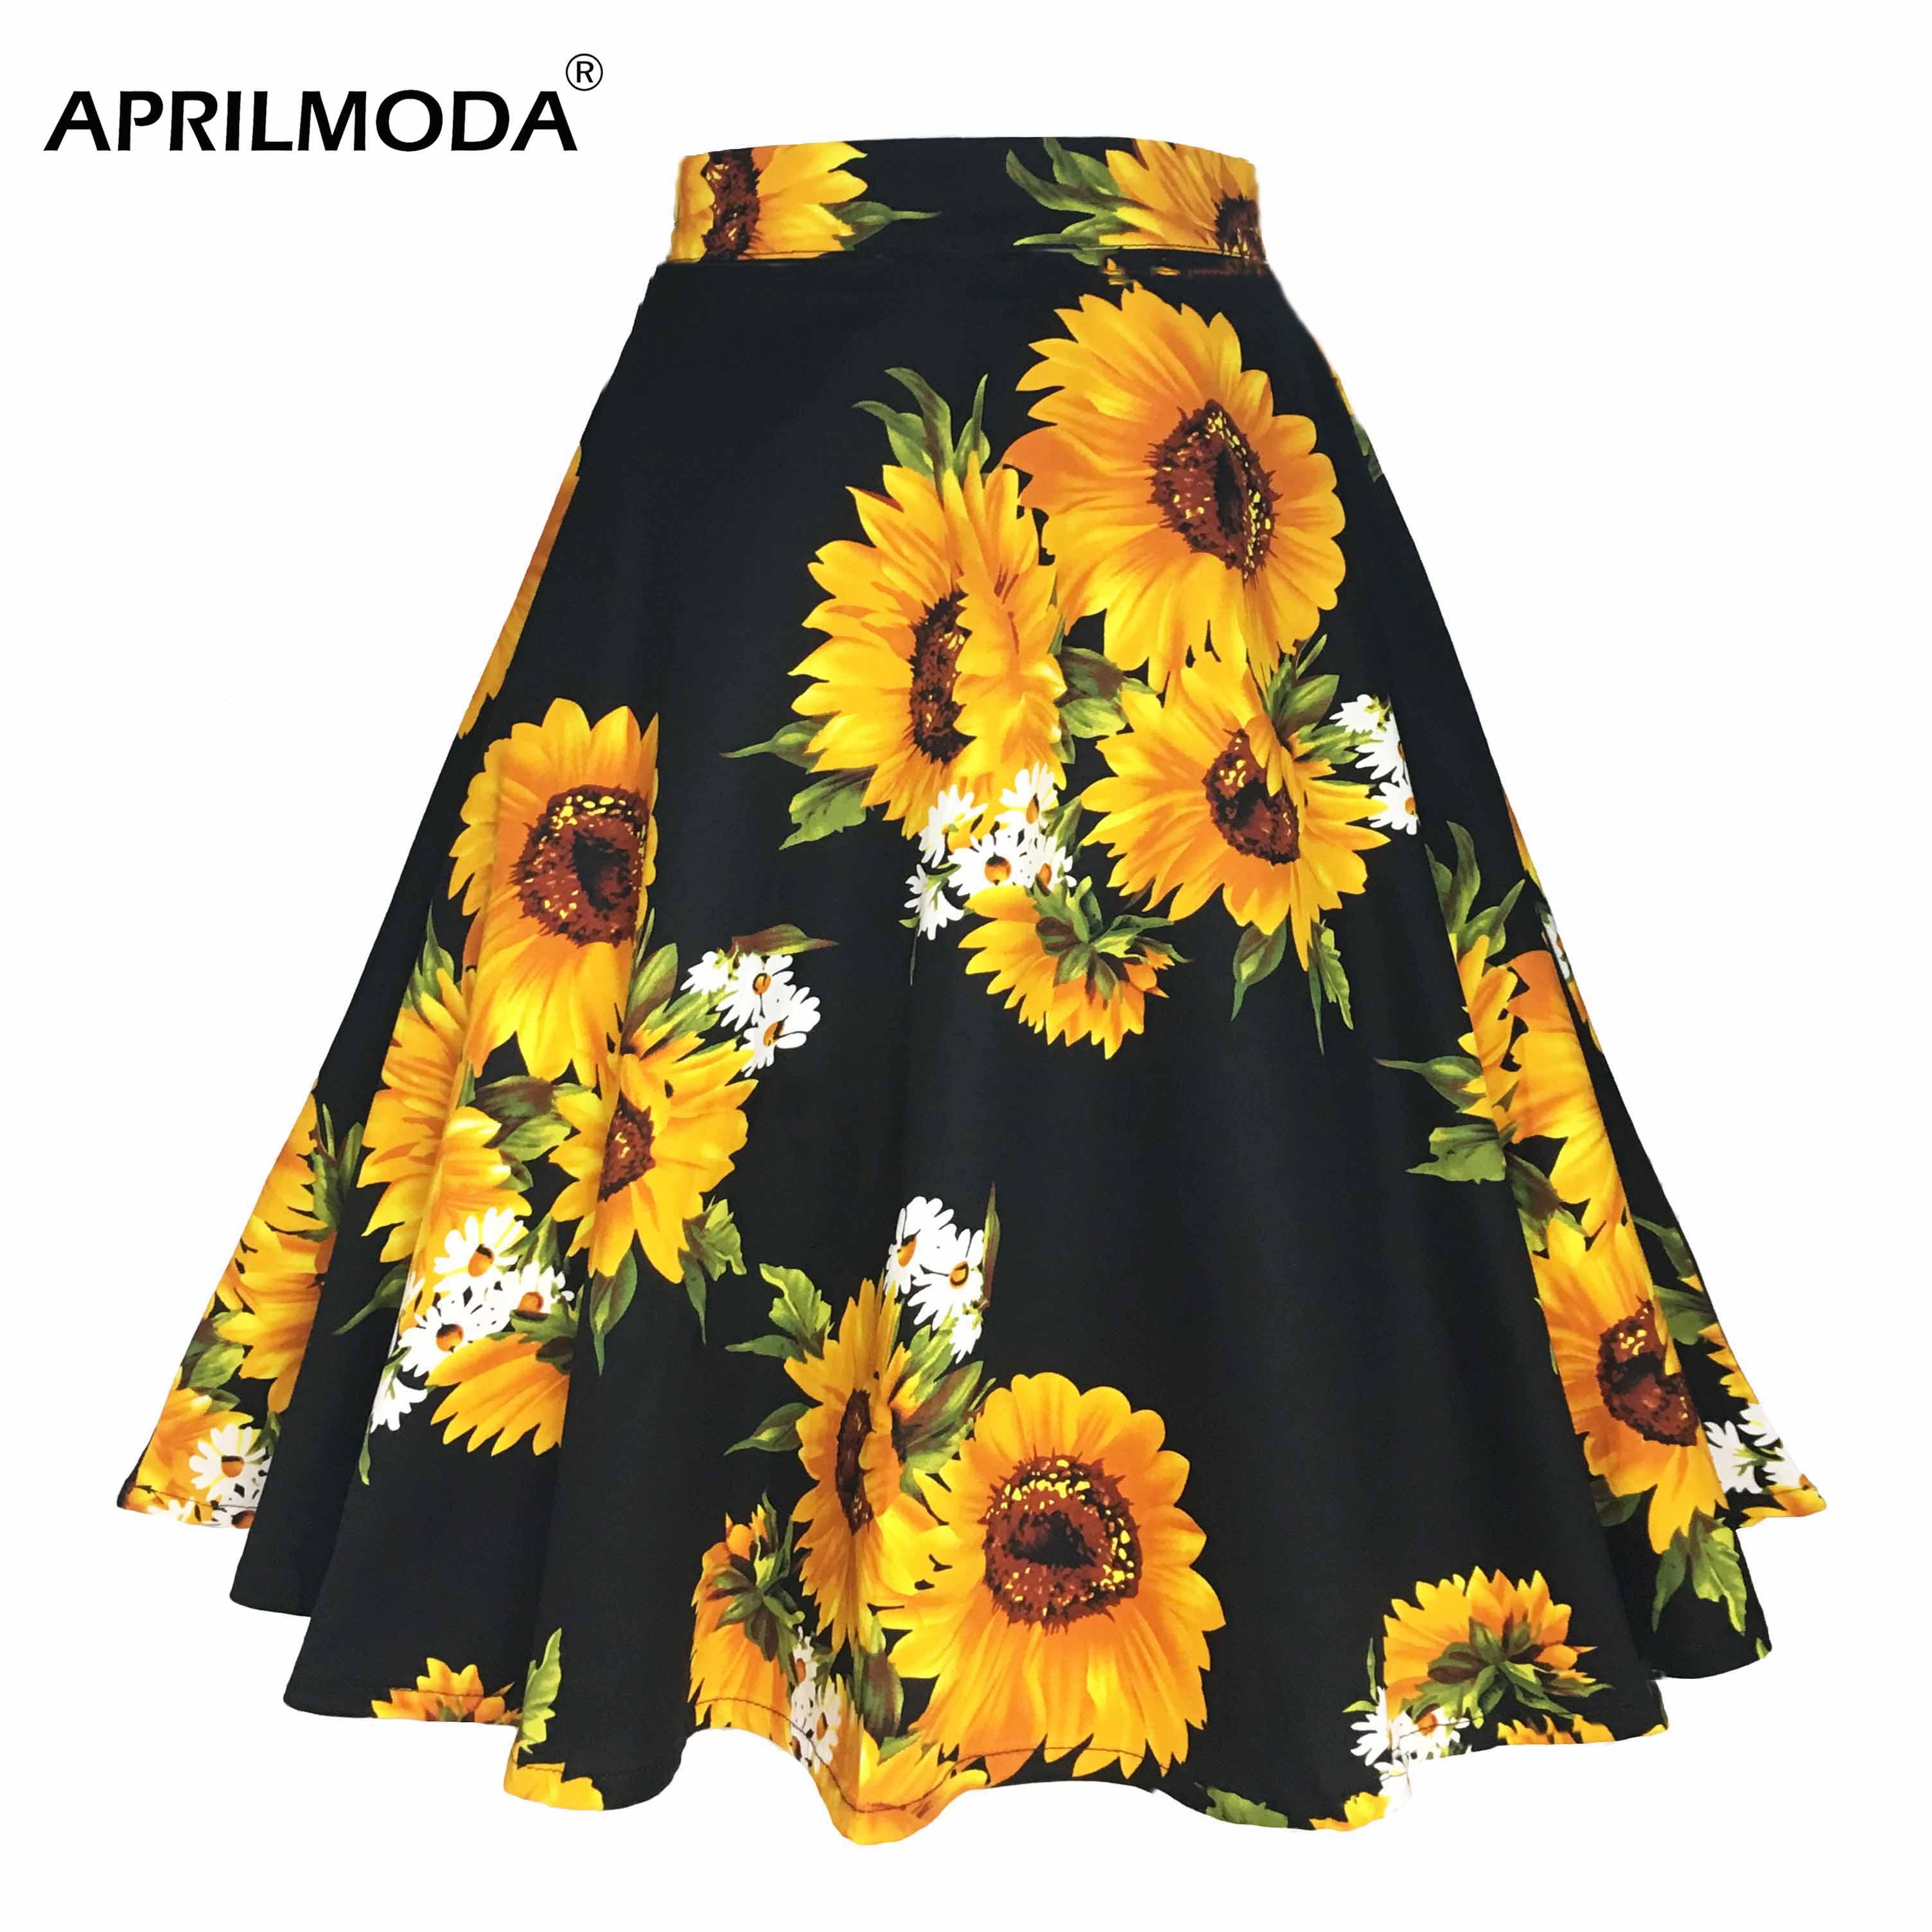 2019 Summer Vintage Casual Skirt Plus Size Floral Sunflower Printed Skater Skirts Swing Zipper Midi Women Pleated Retro Vestidos